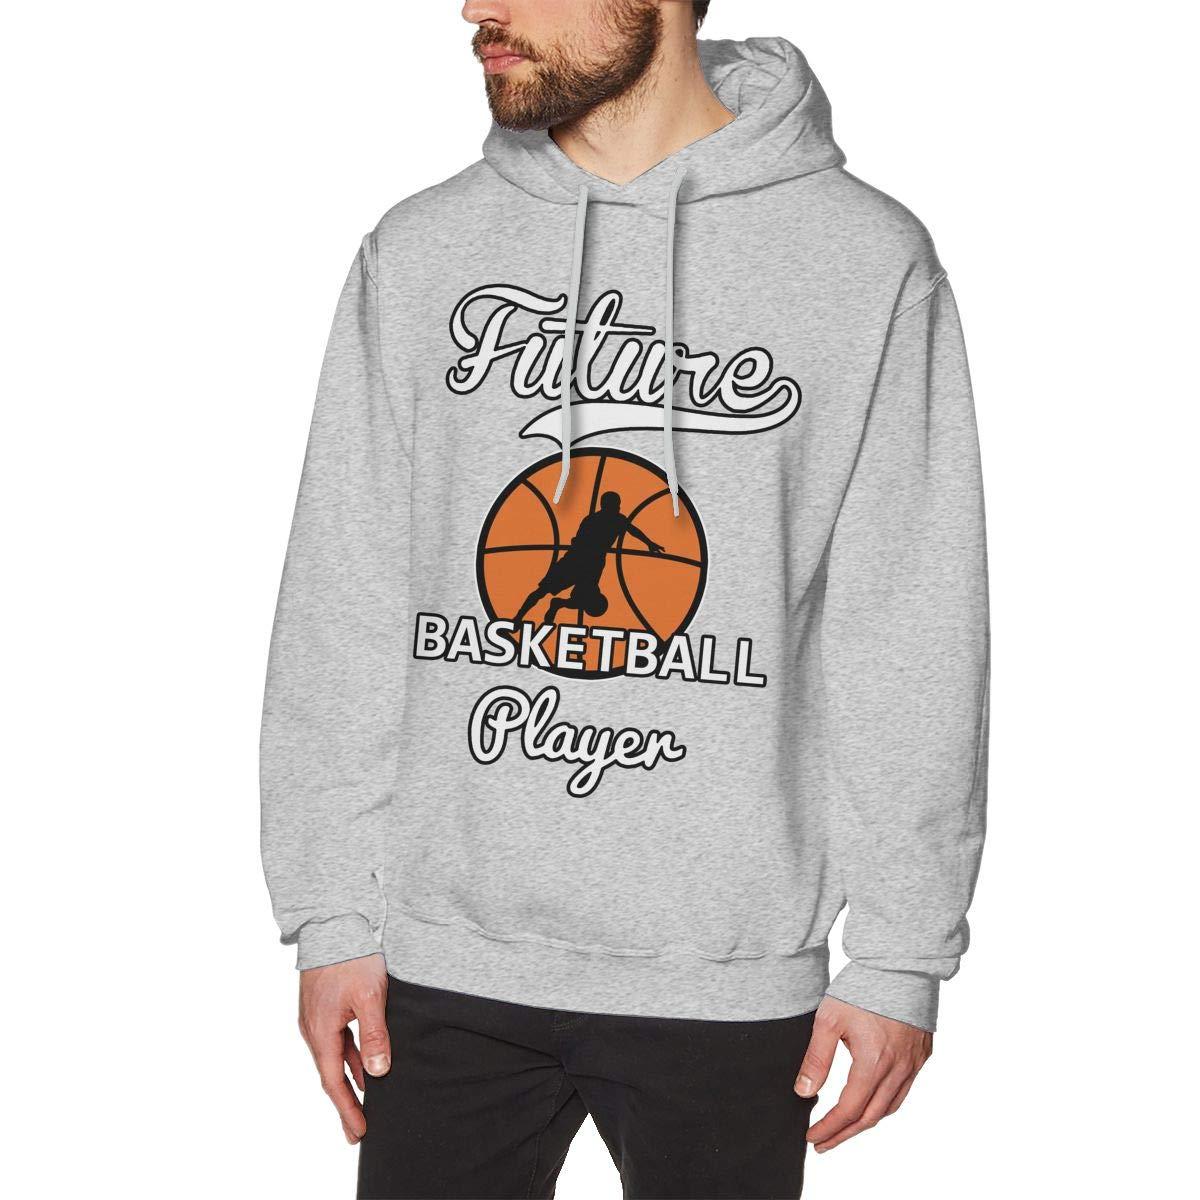 JIAU HUA Future Basketball Player Mens Hooded Sweatshirt Leisure 100/% Cotton Pullover Hoodie